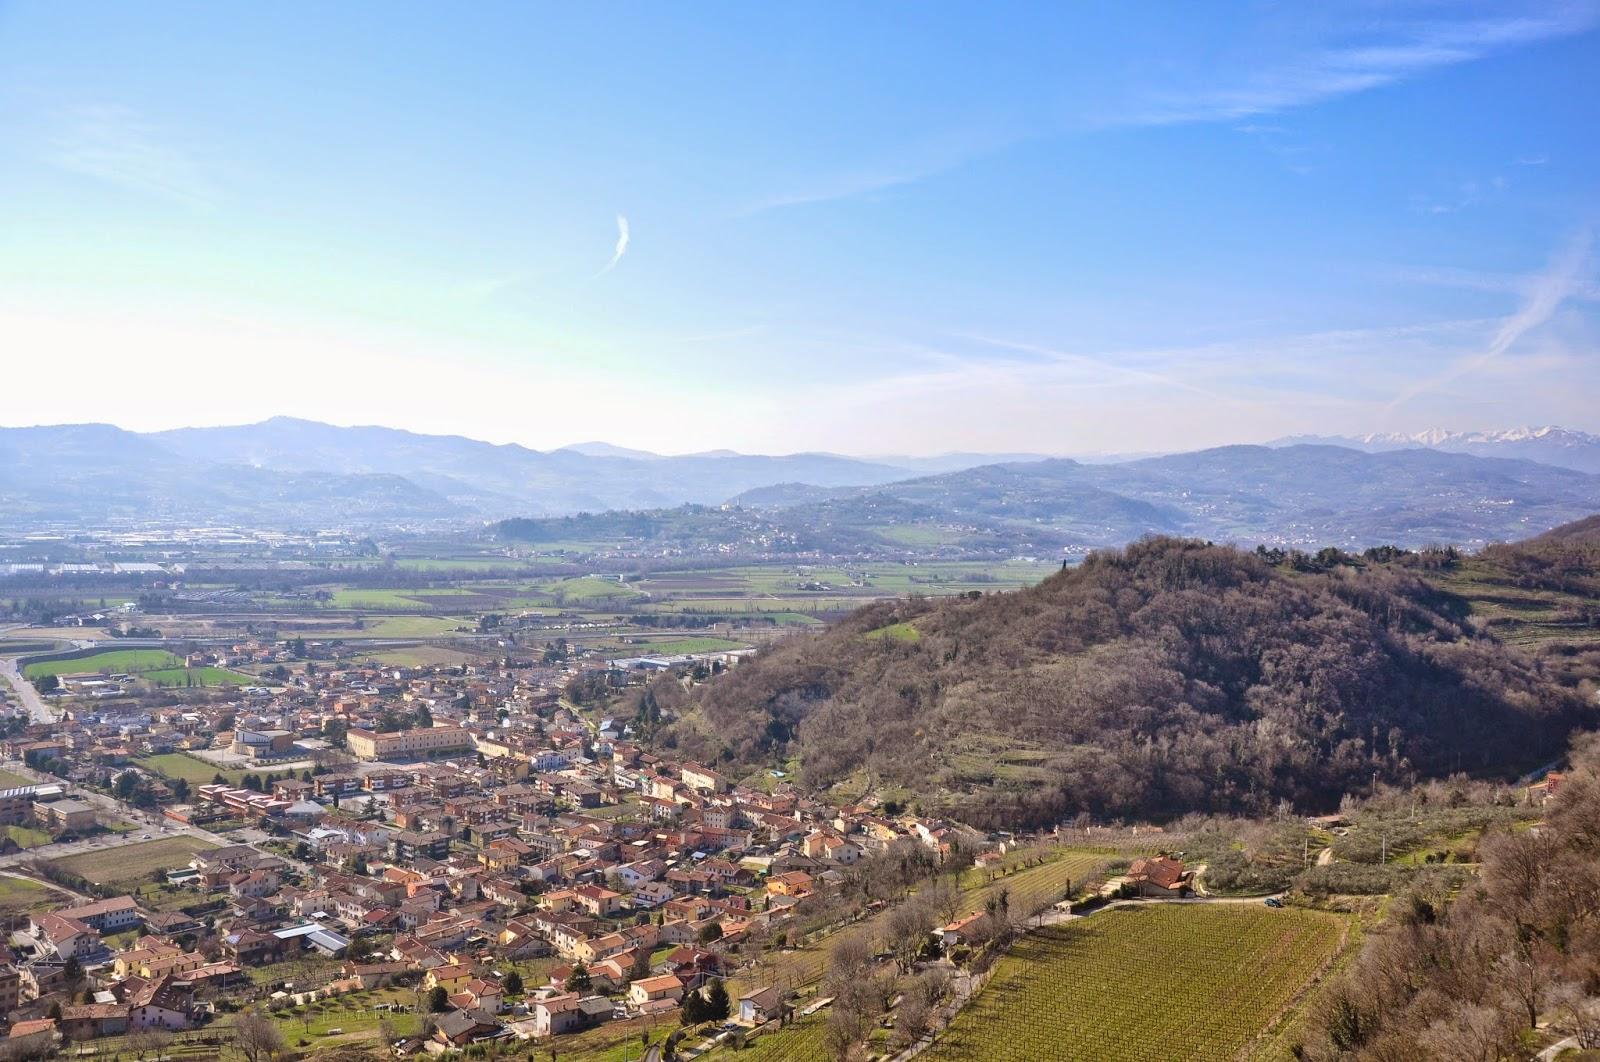 Montechio Maggiore seen from the top of Romeo's Castle, Veneto, Italy